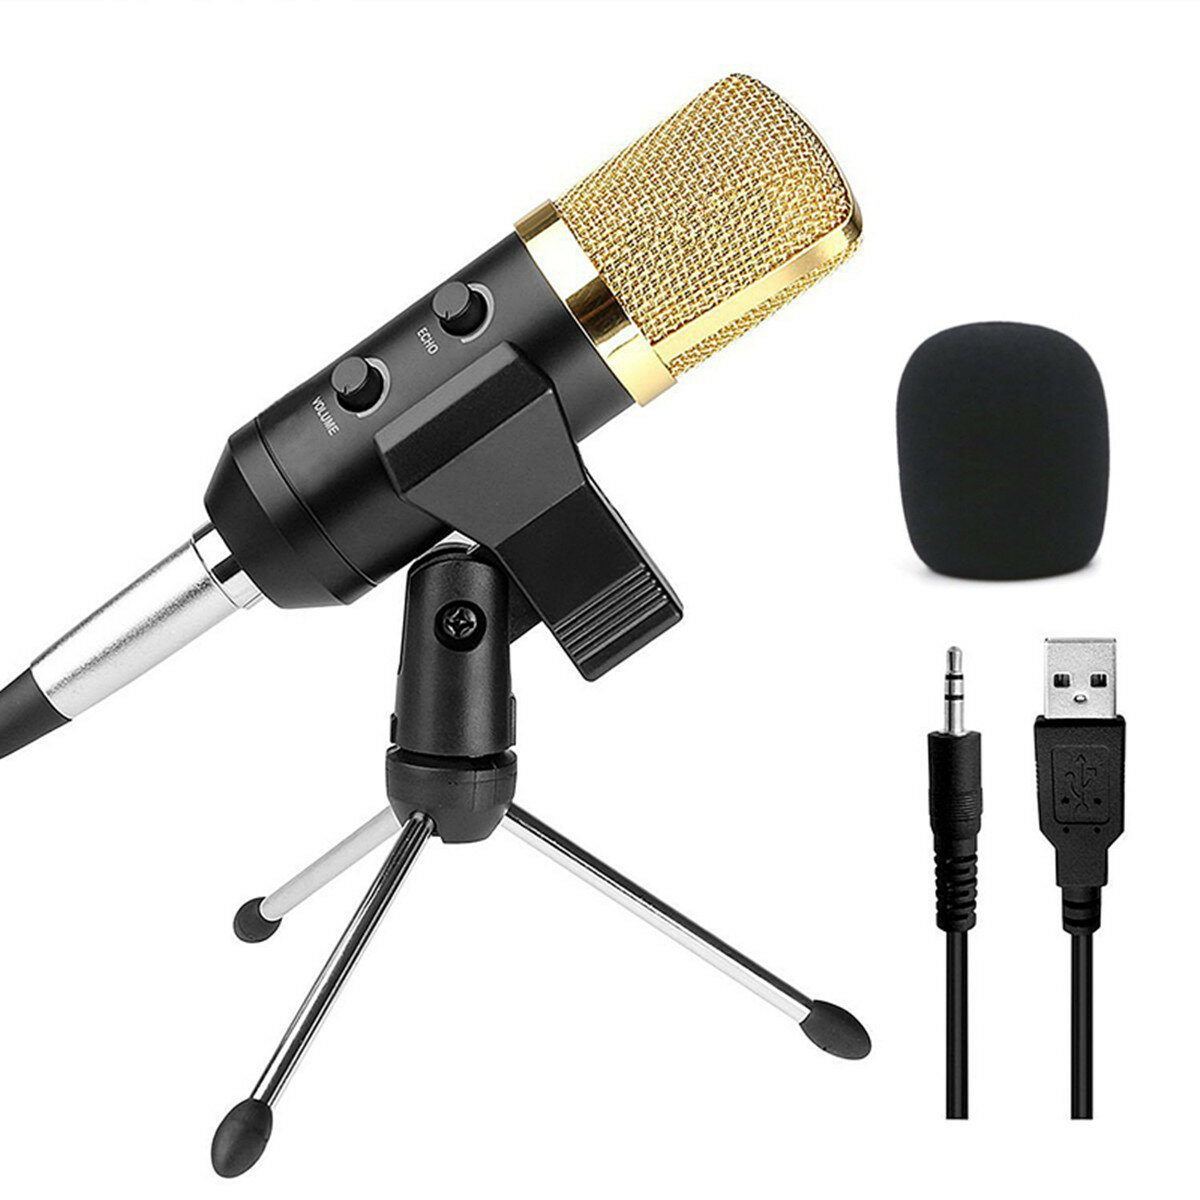 Audio Dynamic USB Condenser Grabación de sonido Vocal Micrófono Mic con soporte de montaje